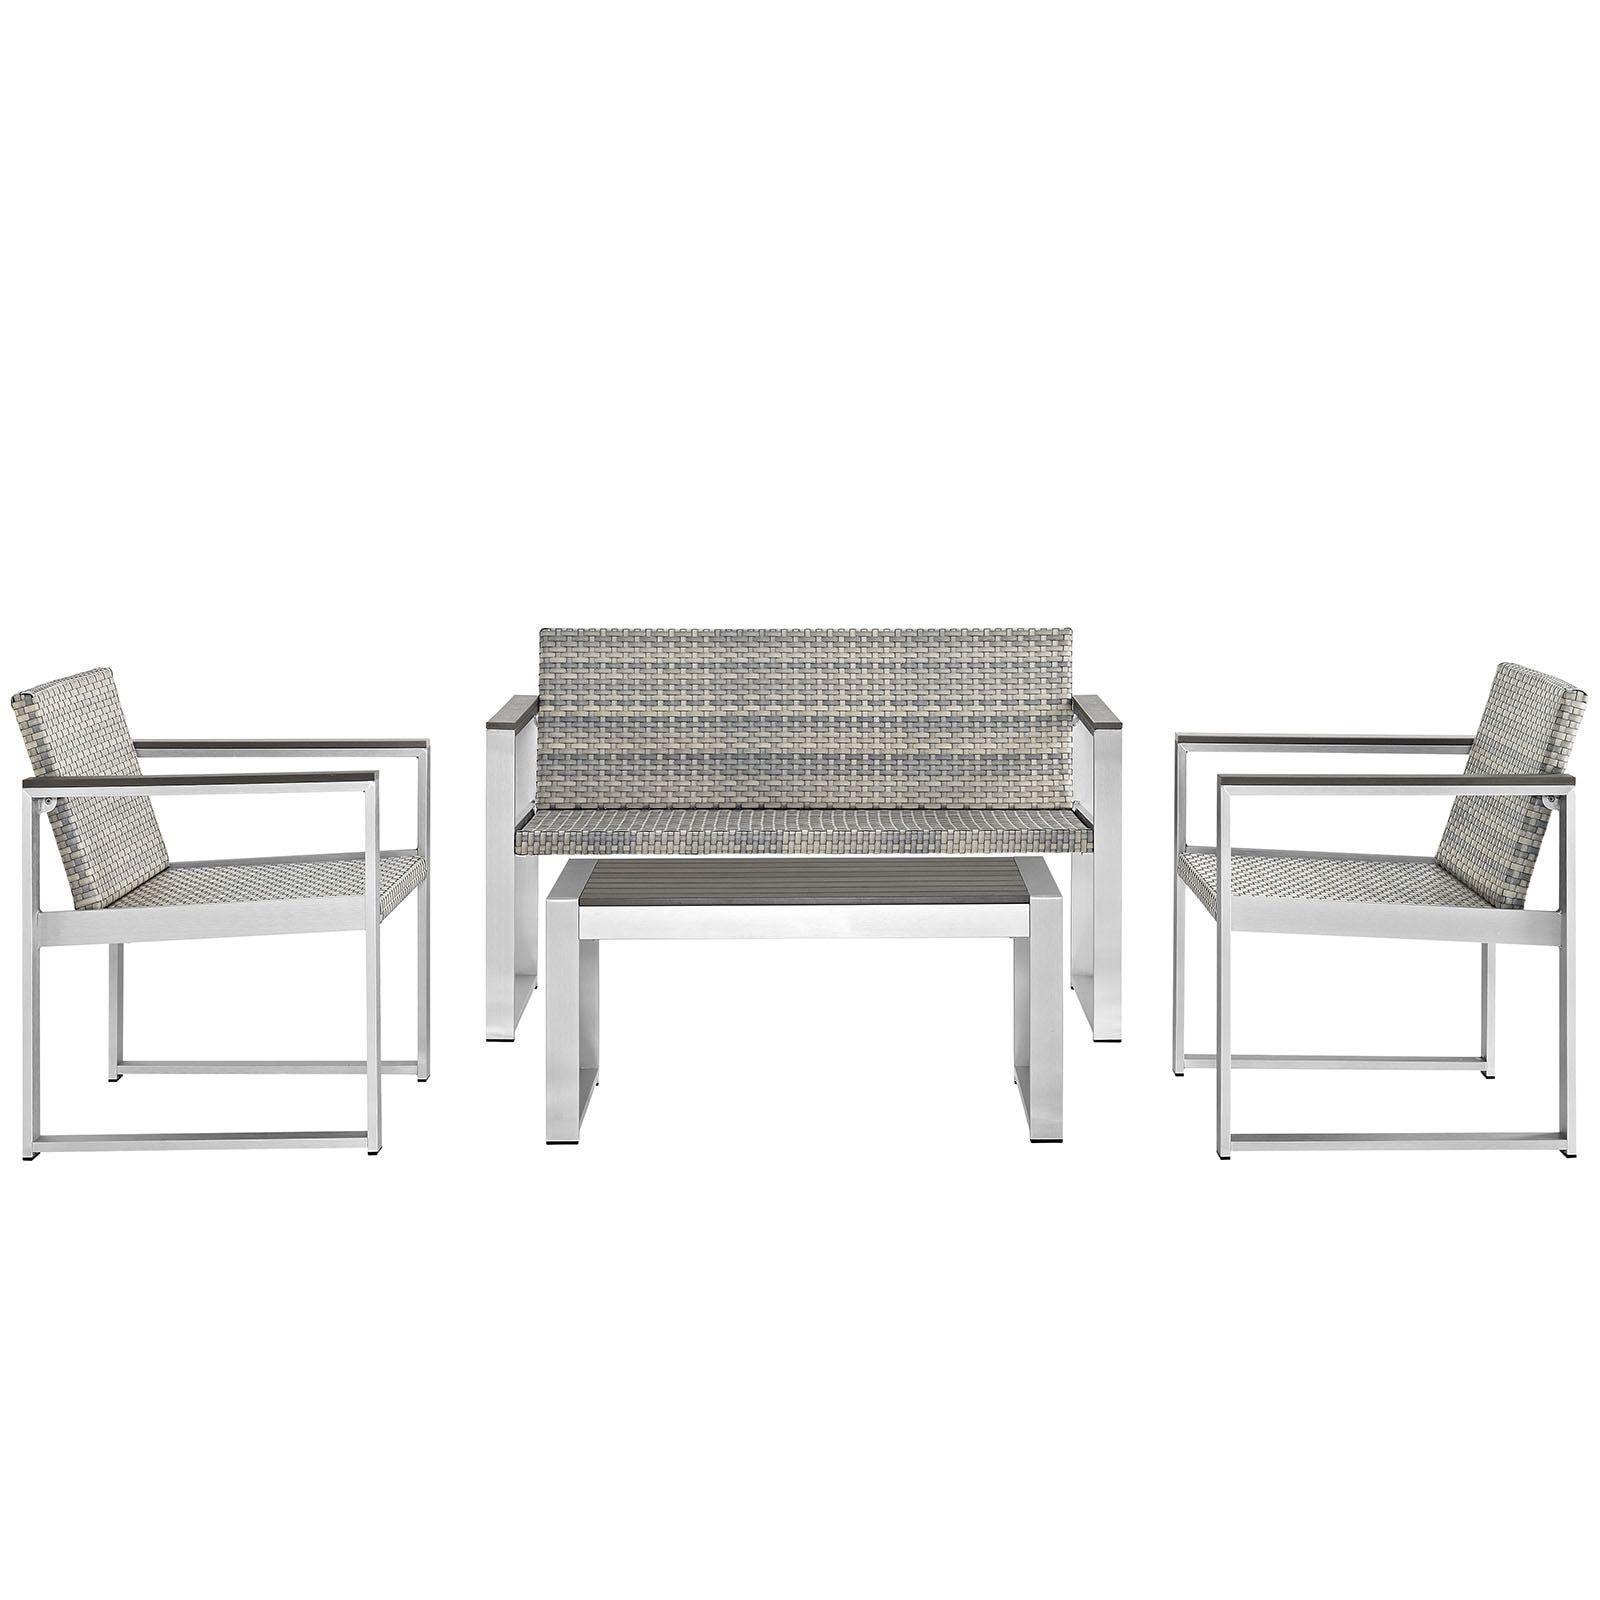 Modway Embark Outdoor Patio 4-Piece Conversation Set (Silver Chocolate (Brown)), Size 4-Piece Sets, Patio Furniture (Aluminum)